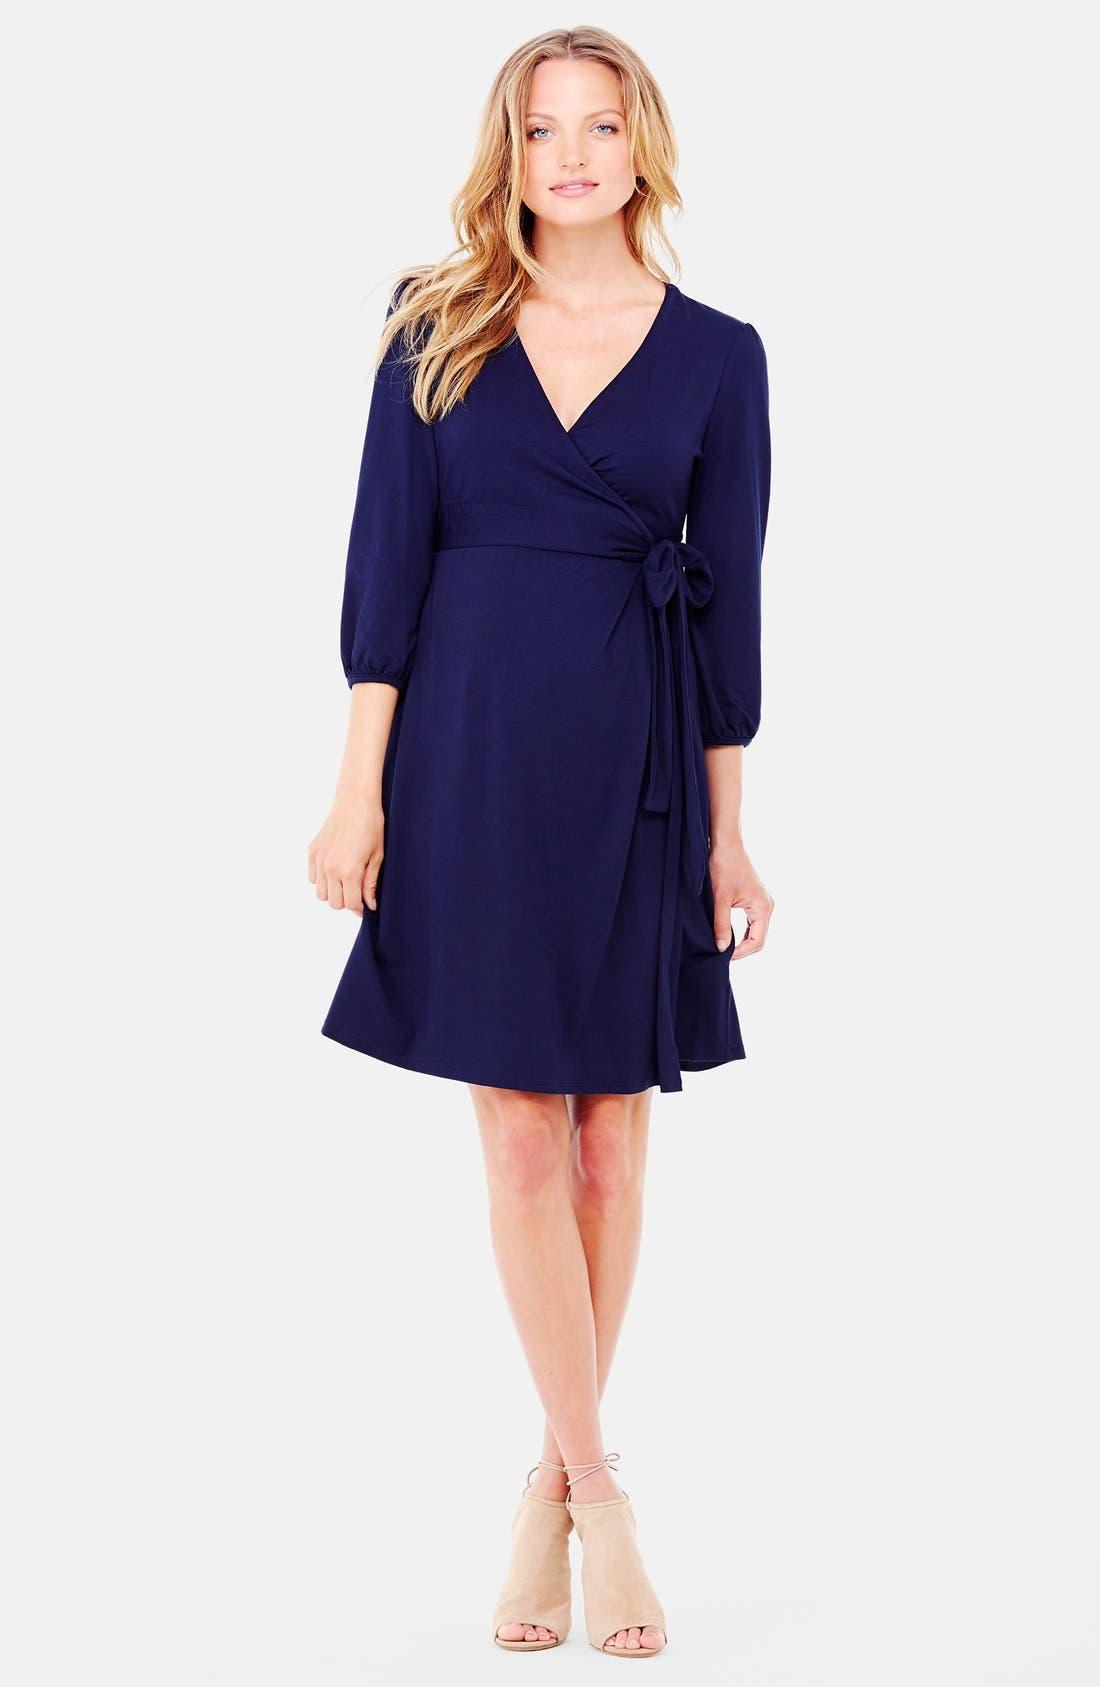 Alternate Image 1 Selected - Ingrid & Isabel® Nursing Friendly Maternity Wrap Dress